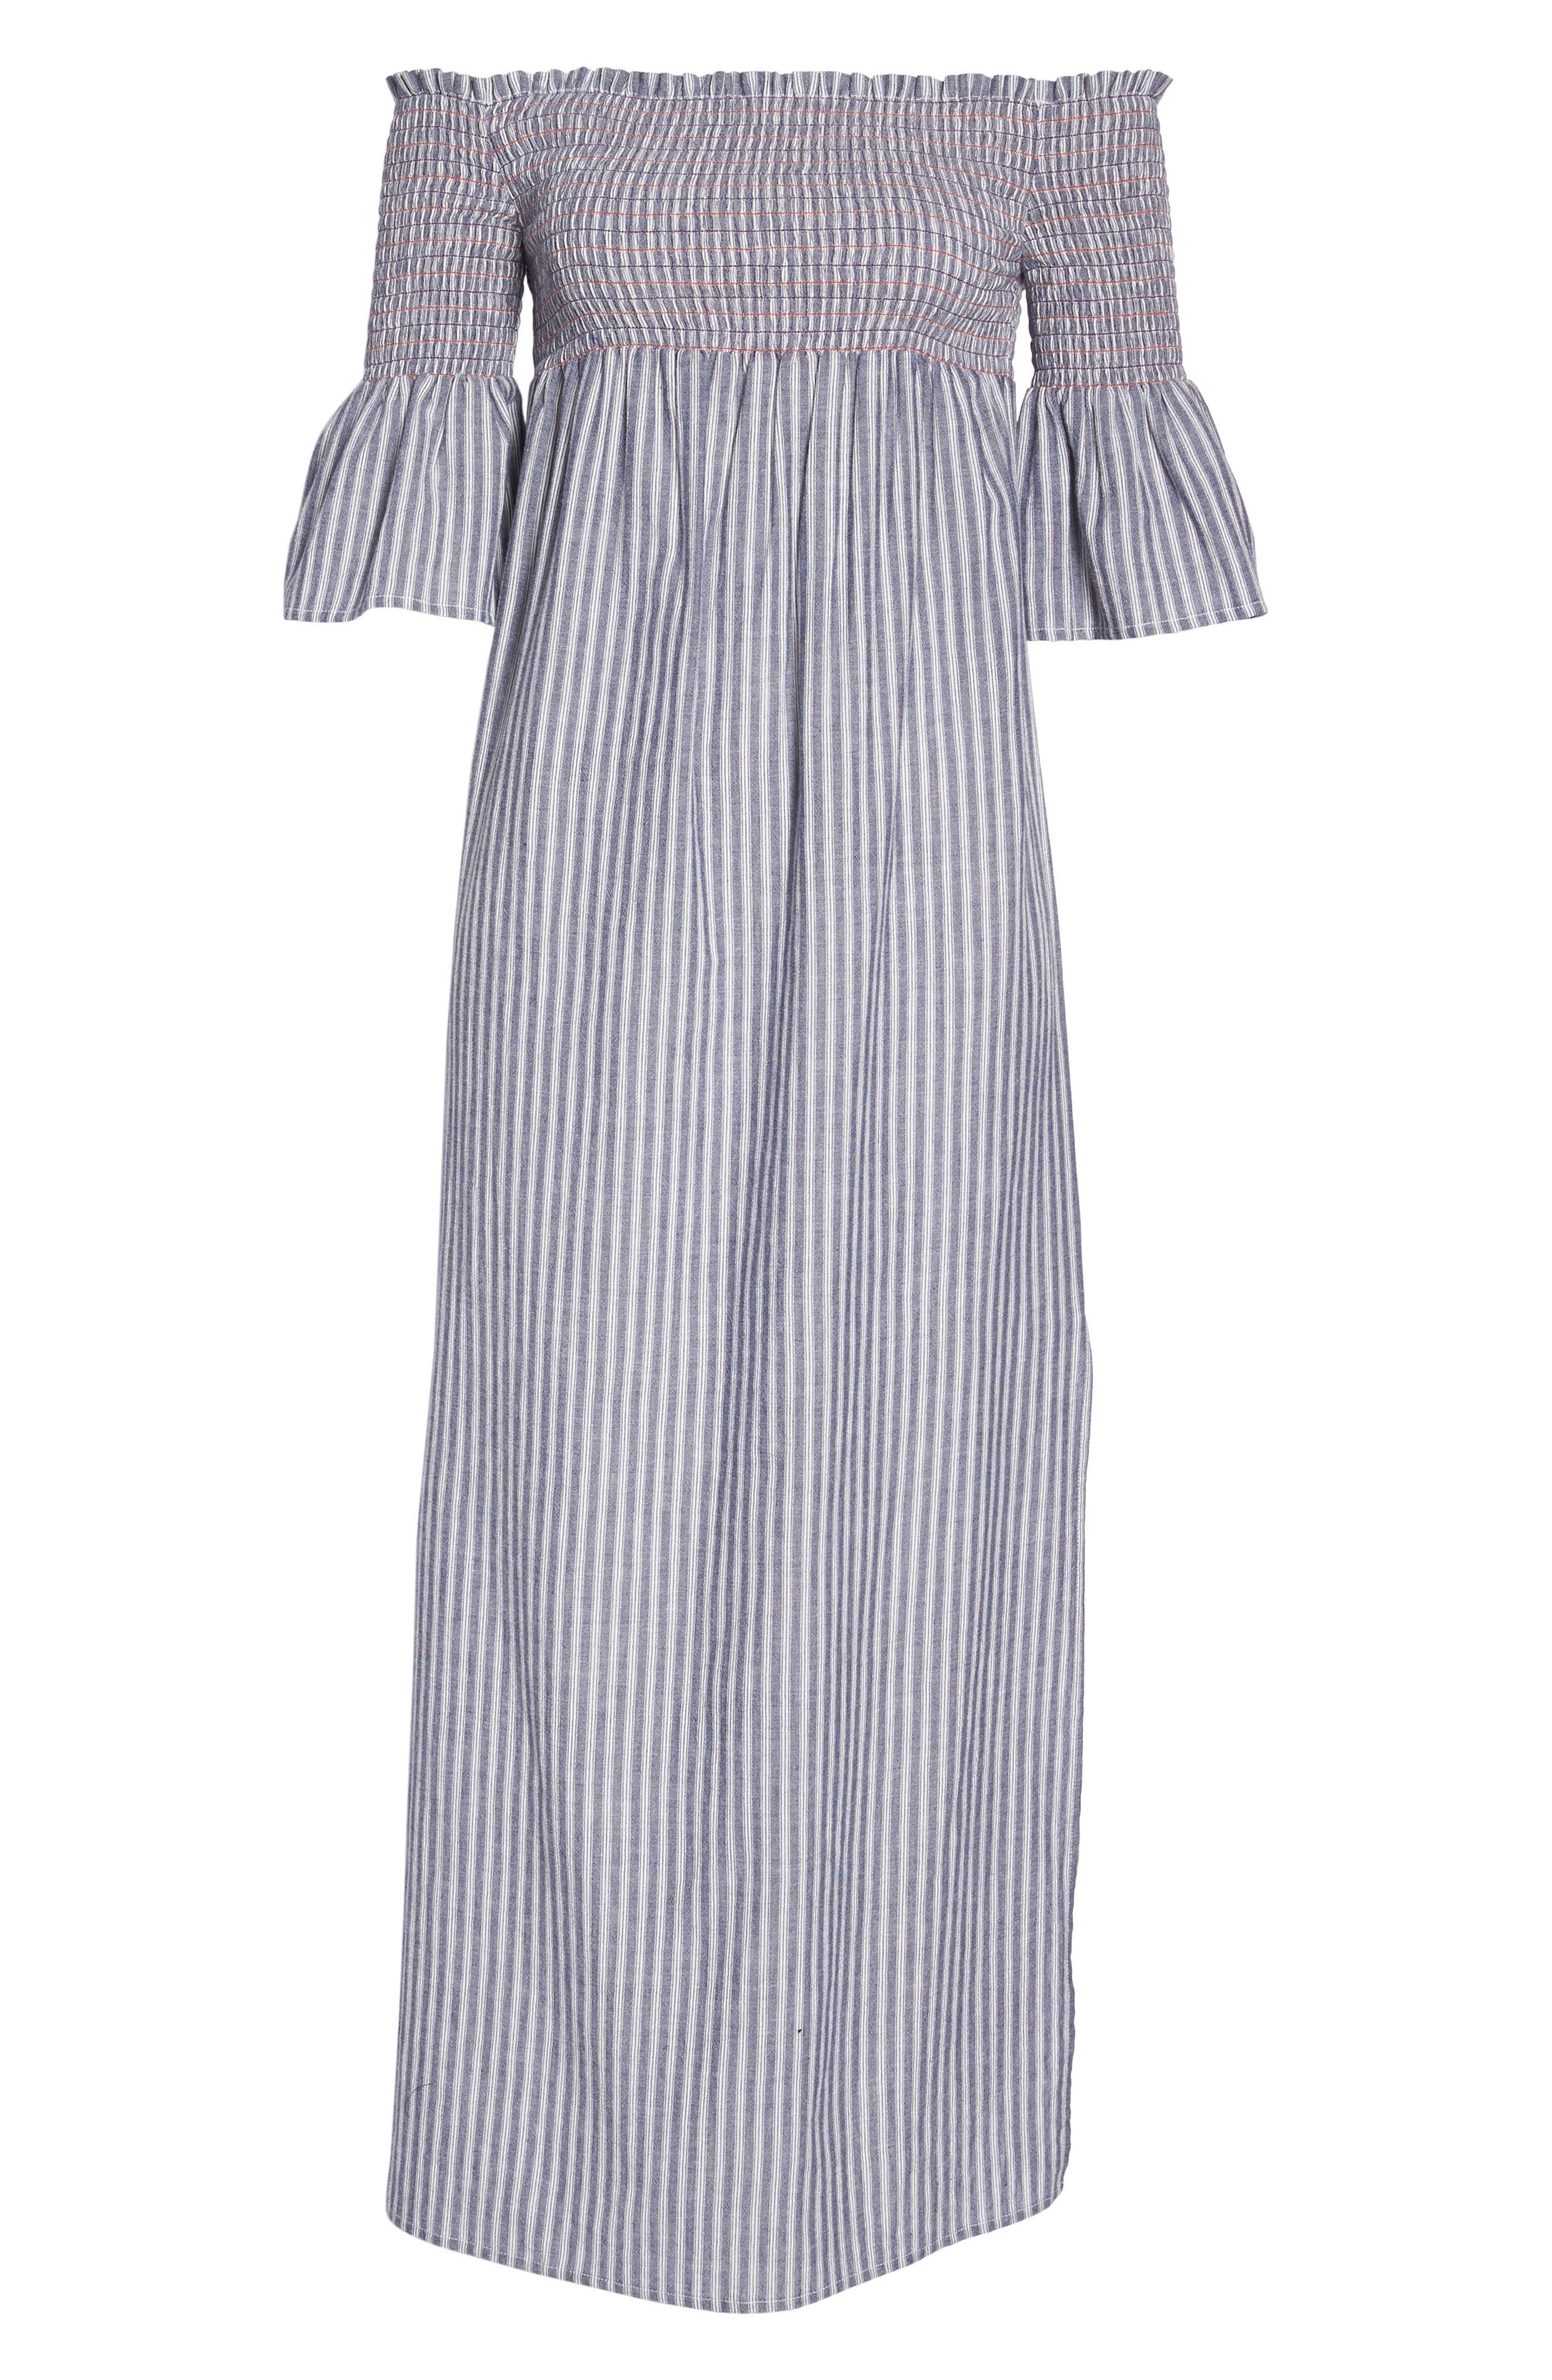 Carmel Smocked Off the Shoulder Maxi Dress,                             Alternate thumbnail 7, color,                             Chambray